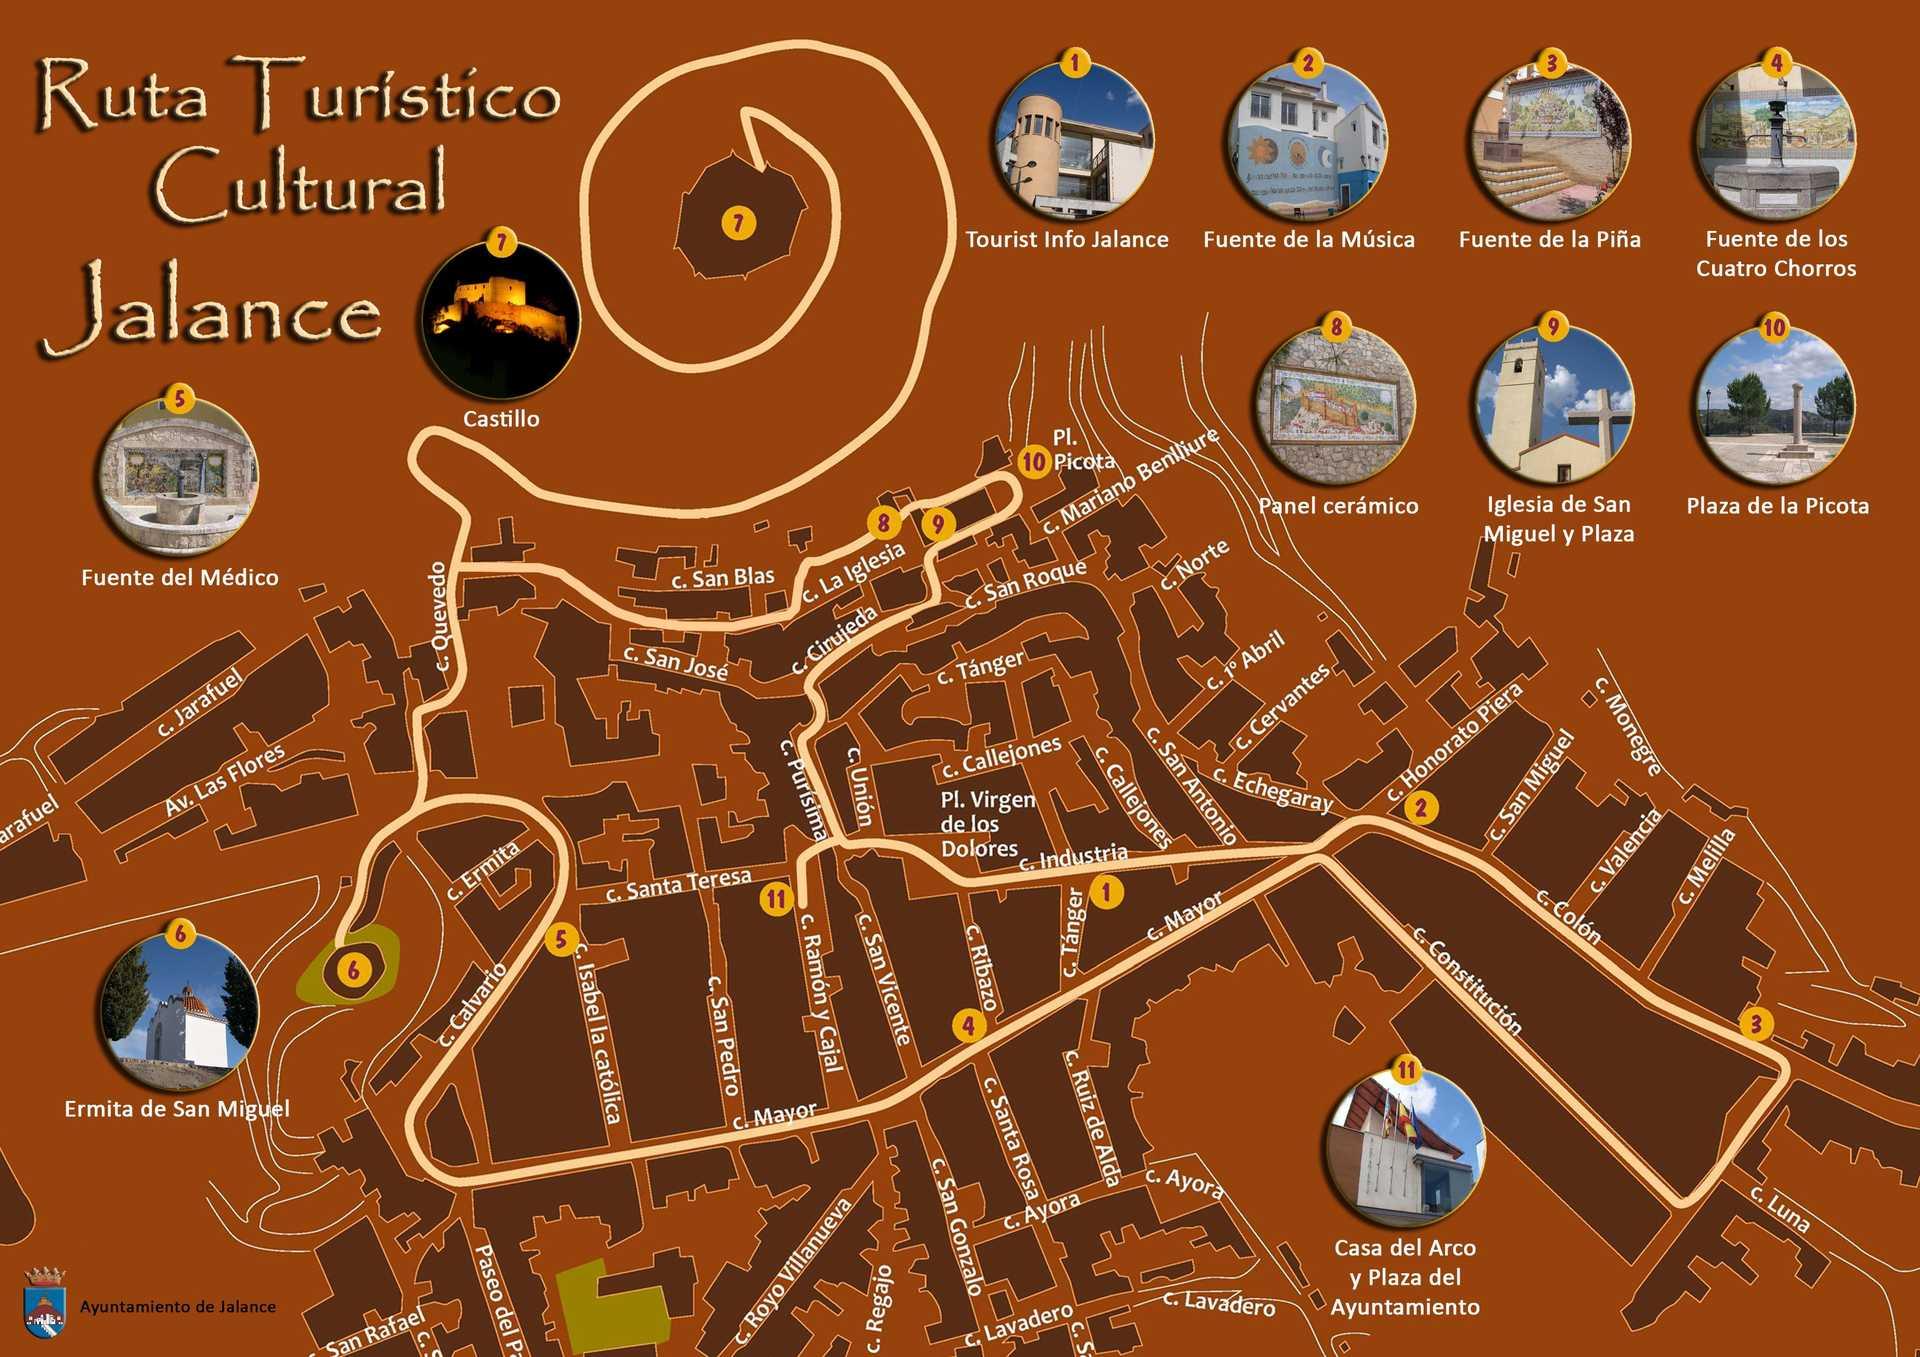 Ruta turístico-cultural Jalance